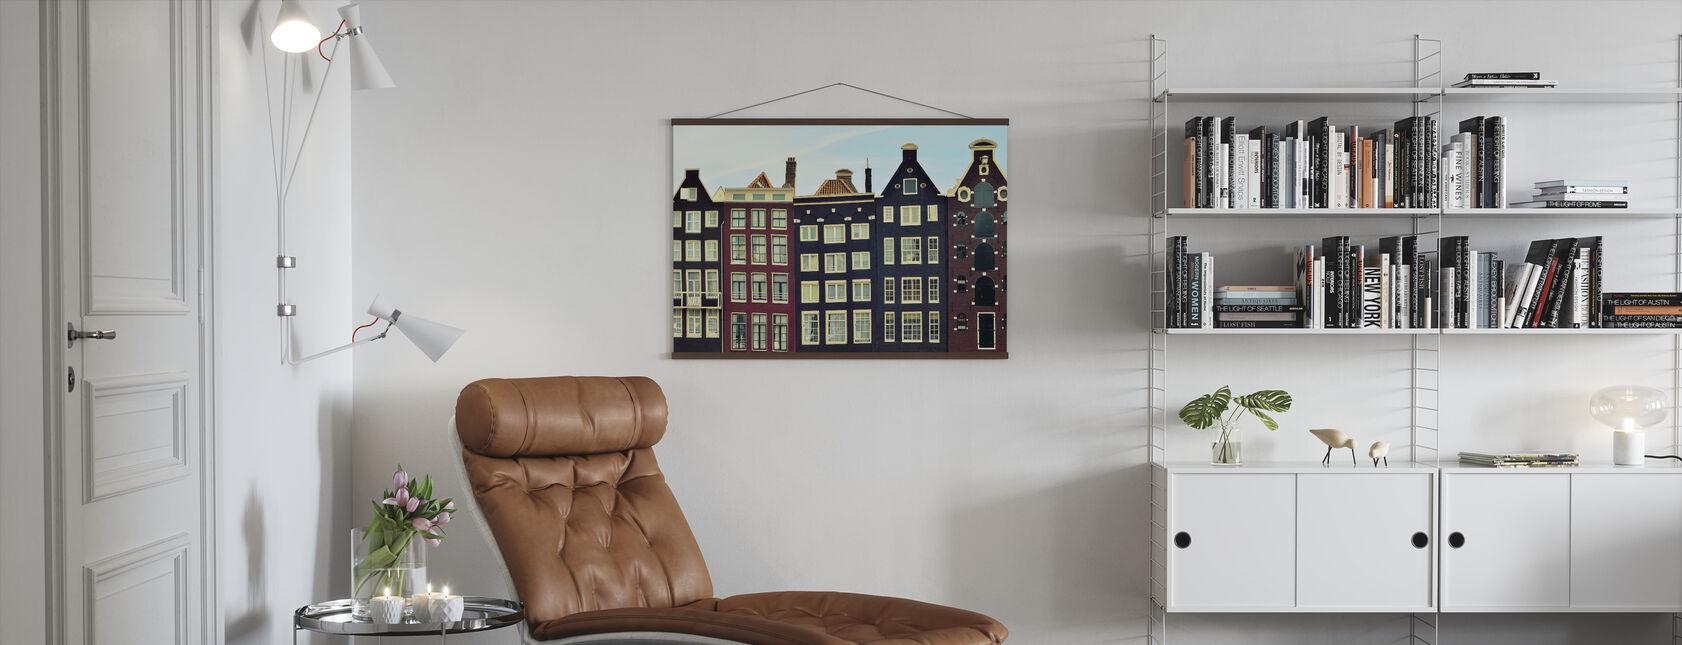 Amsterdam Houses - Poster - Living Room